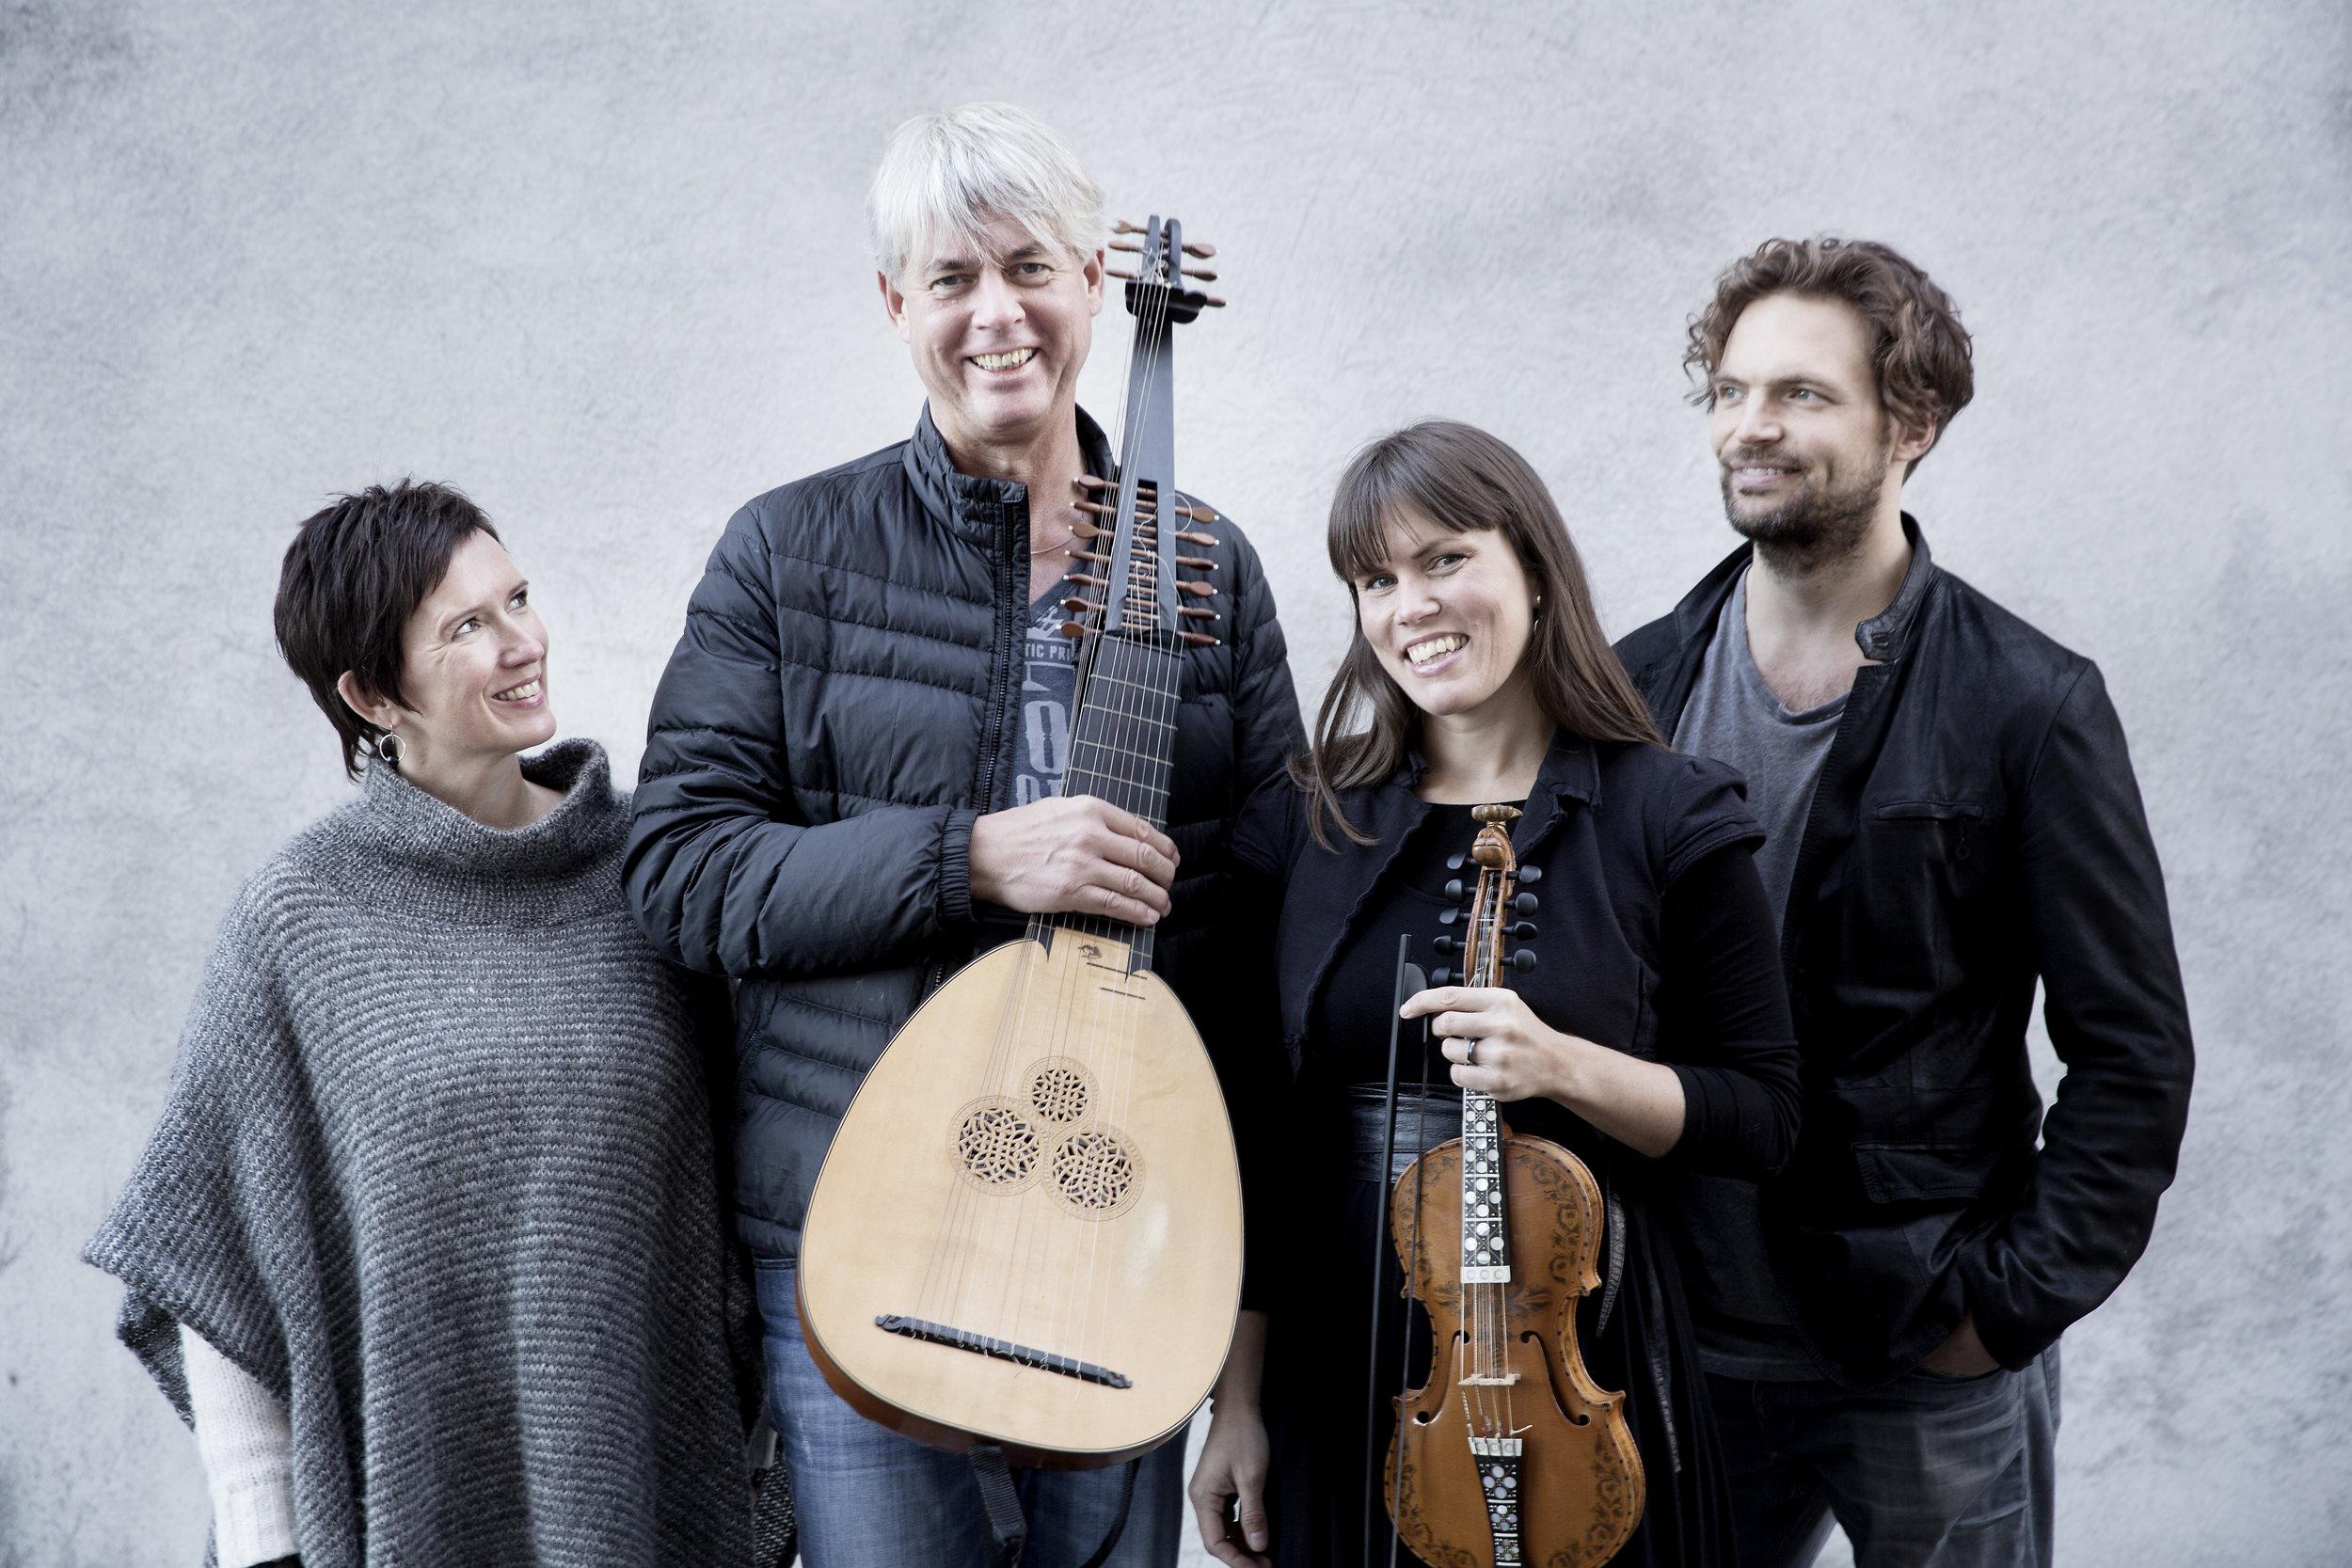 TIDEKVERV med Berit Opheim, Rolf Lislevand, Benedicte Maurseth og Håkon Mørch Stene. Foto: Paal Audestad